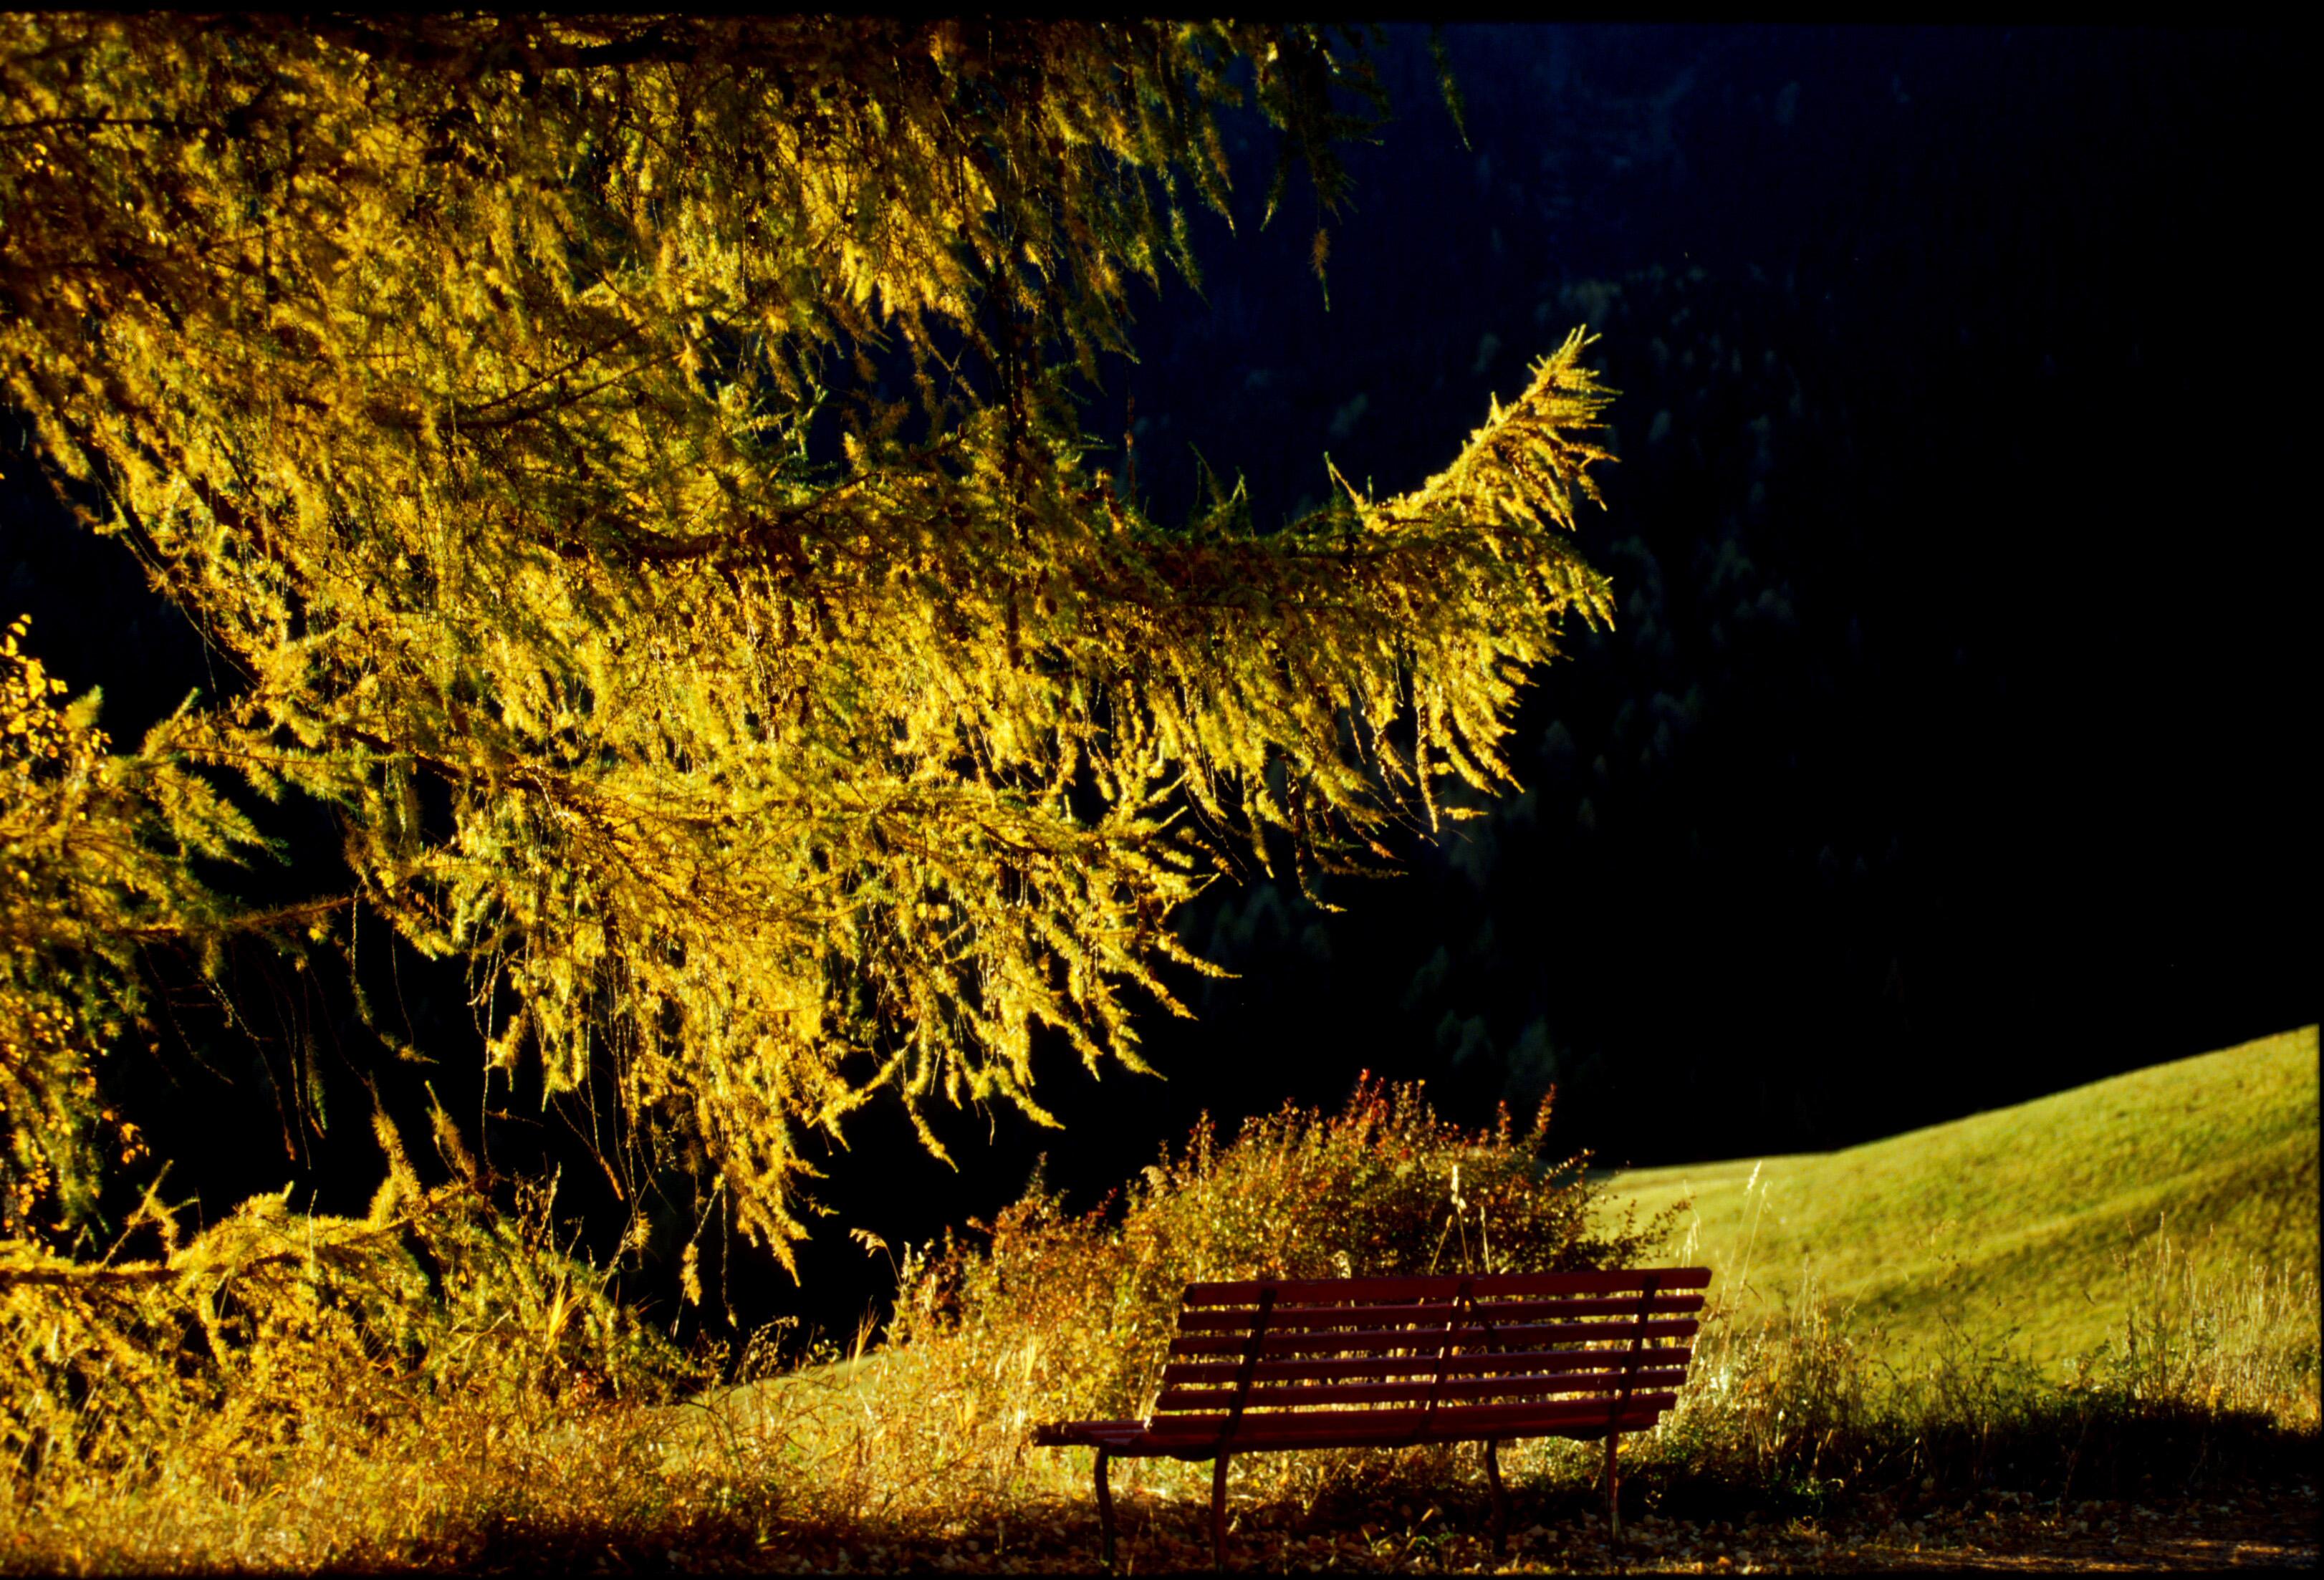 """Hidden away under the leaves, one flower still remains."""